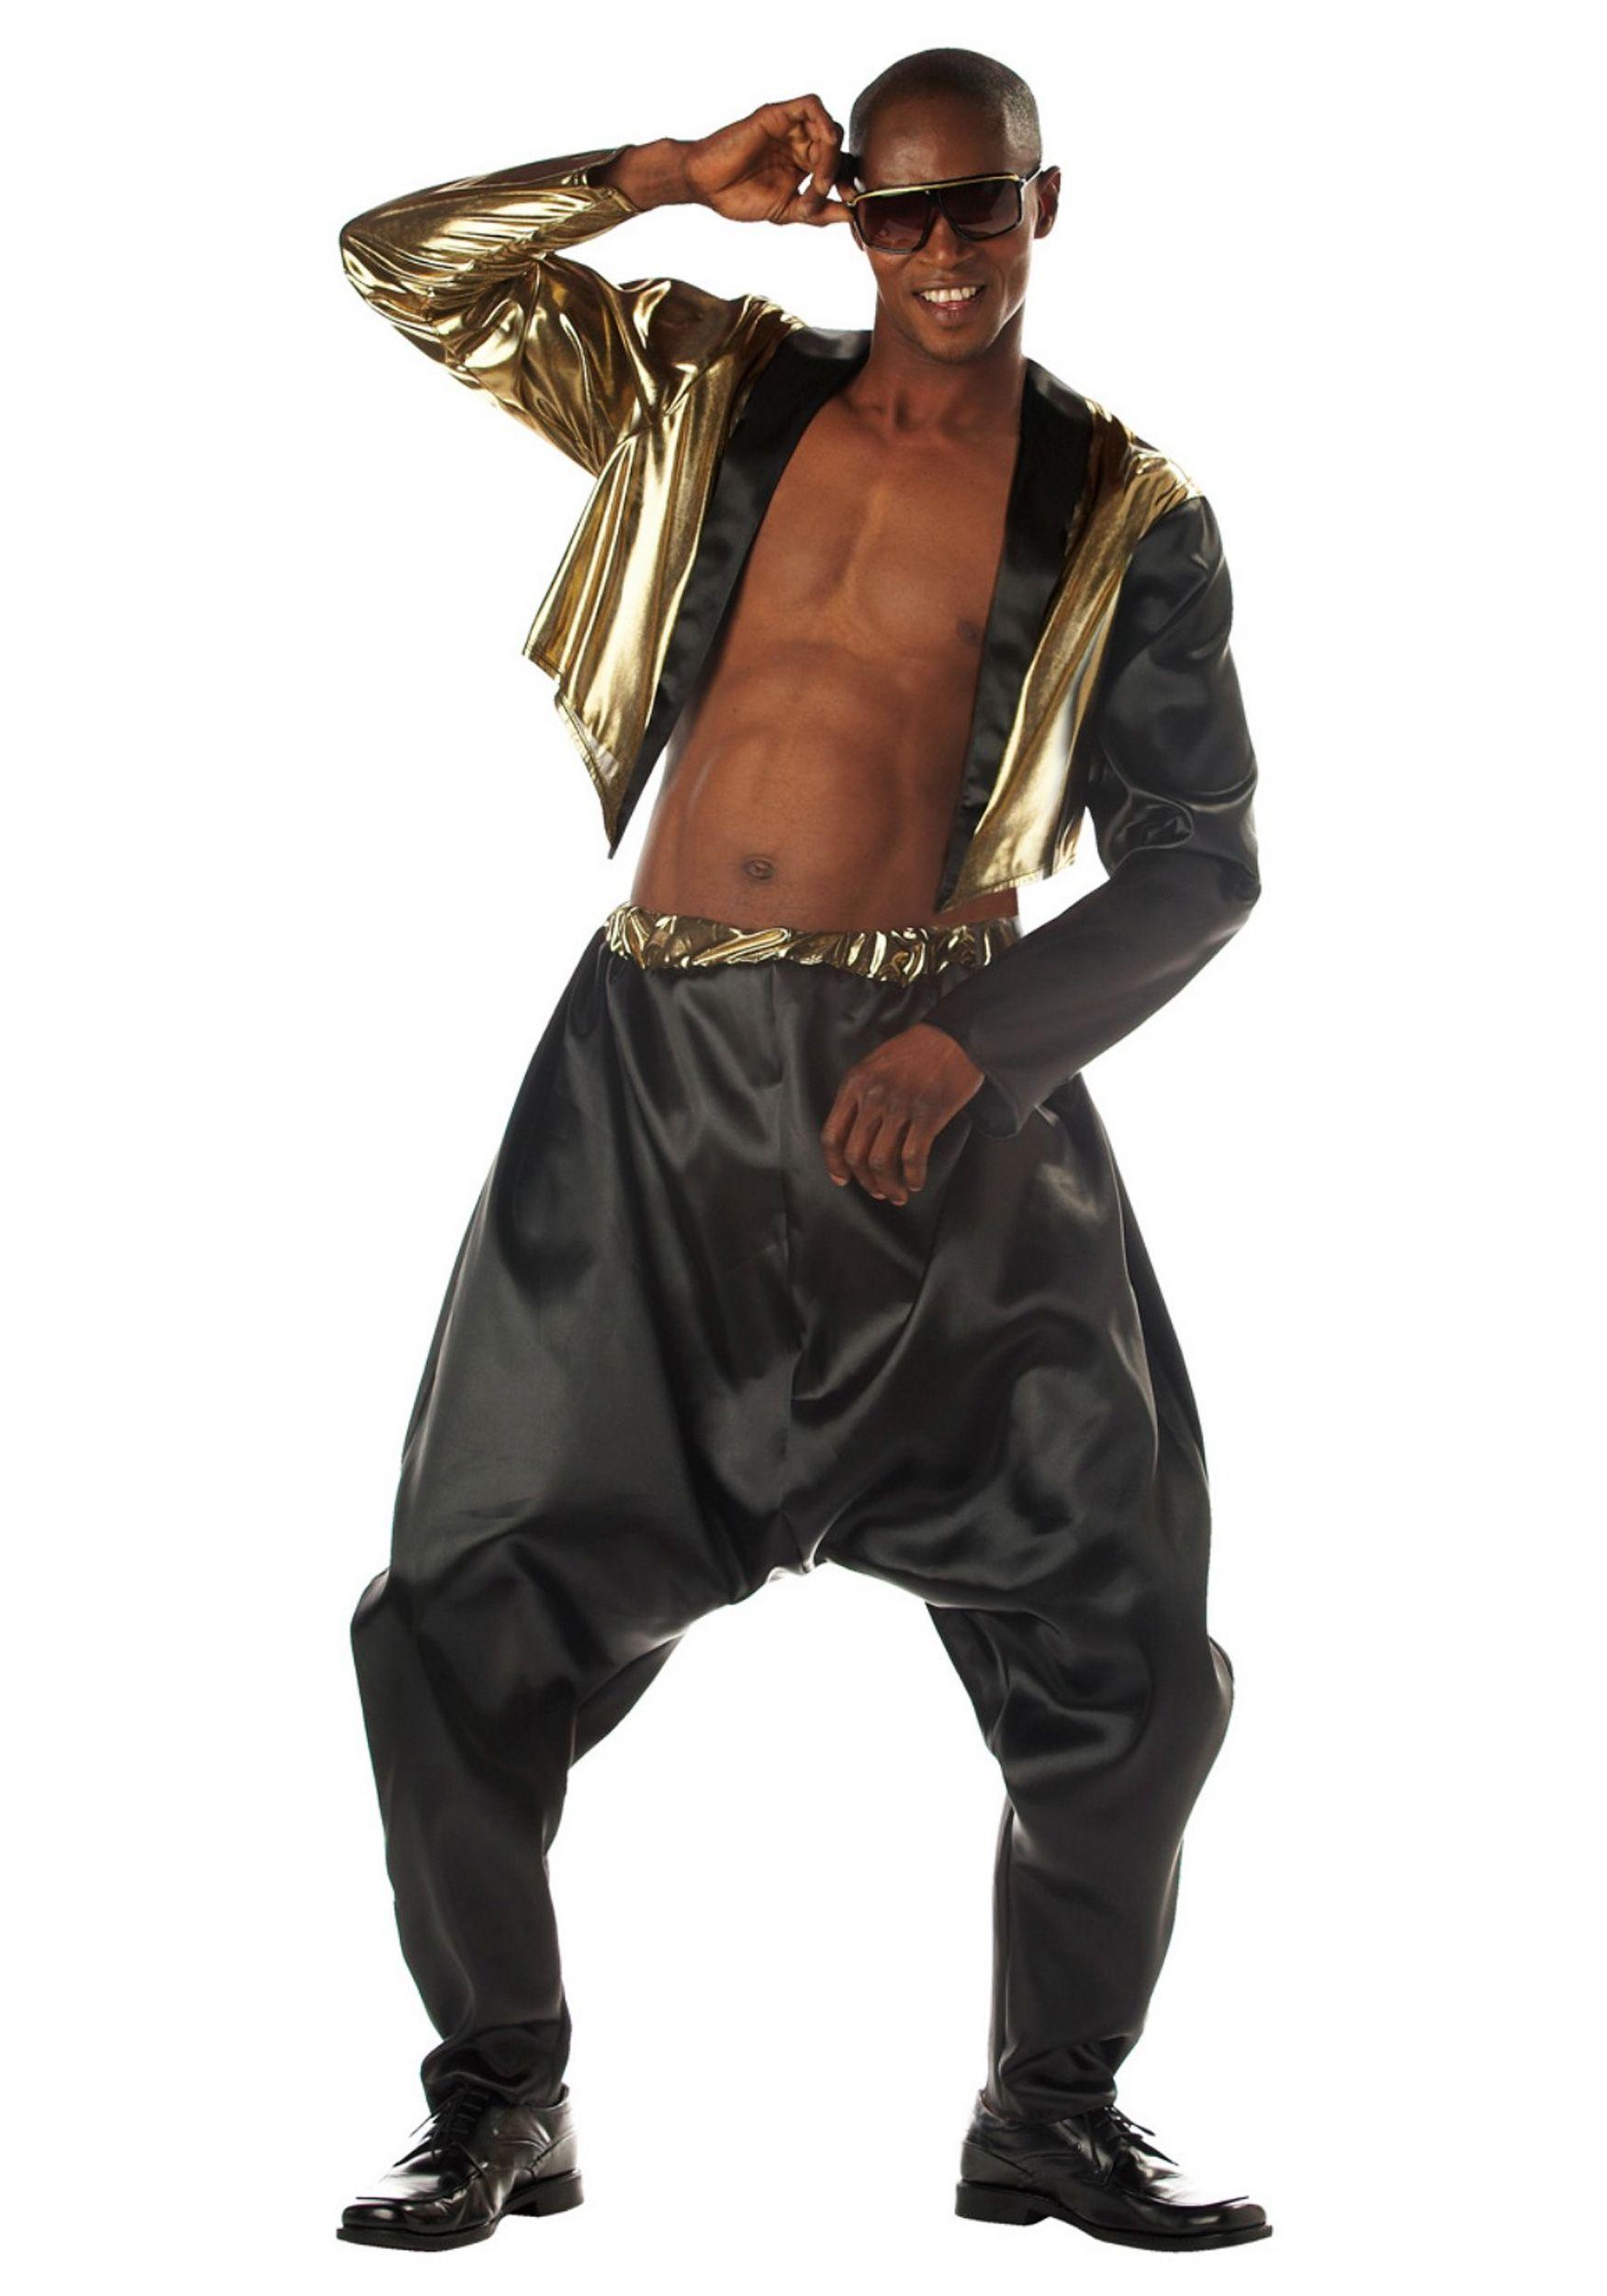 Old School Hip Hop Graphic Leggings Dress Up Halloween Adult Costume Accessory